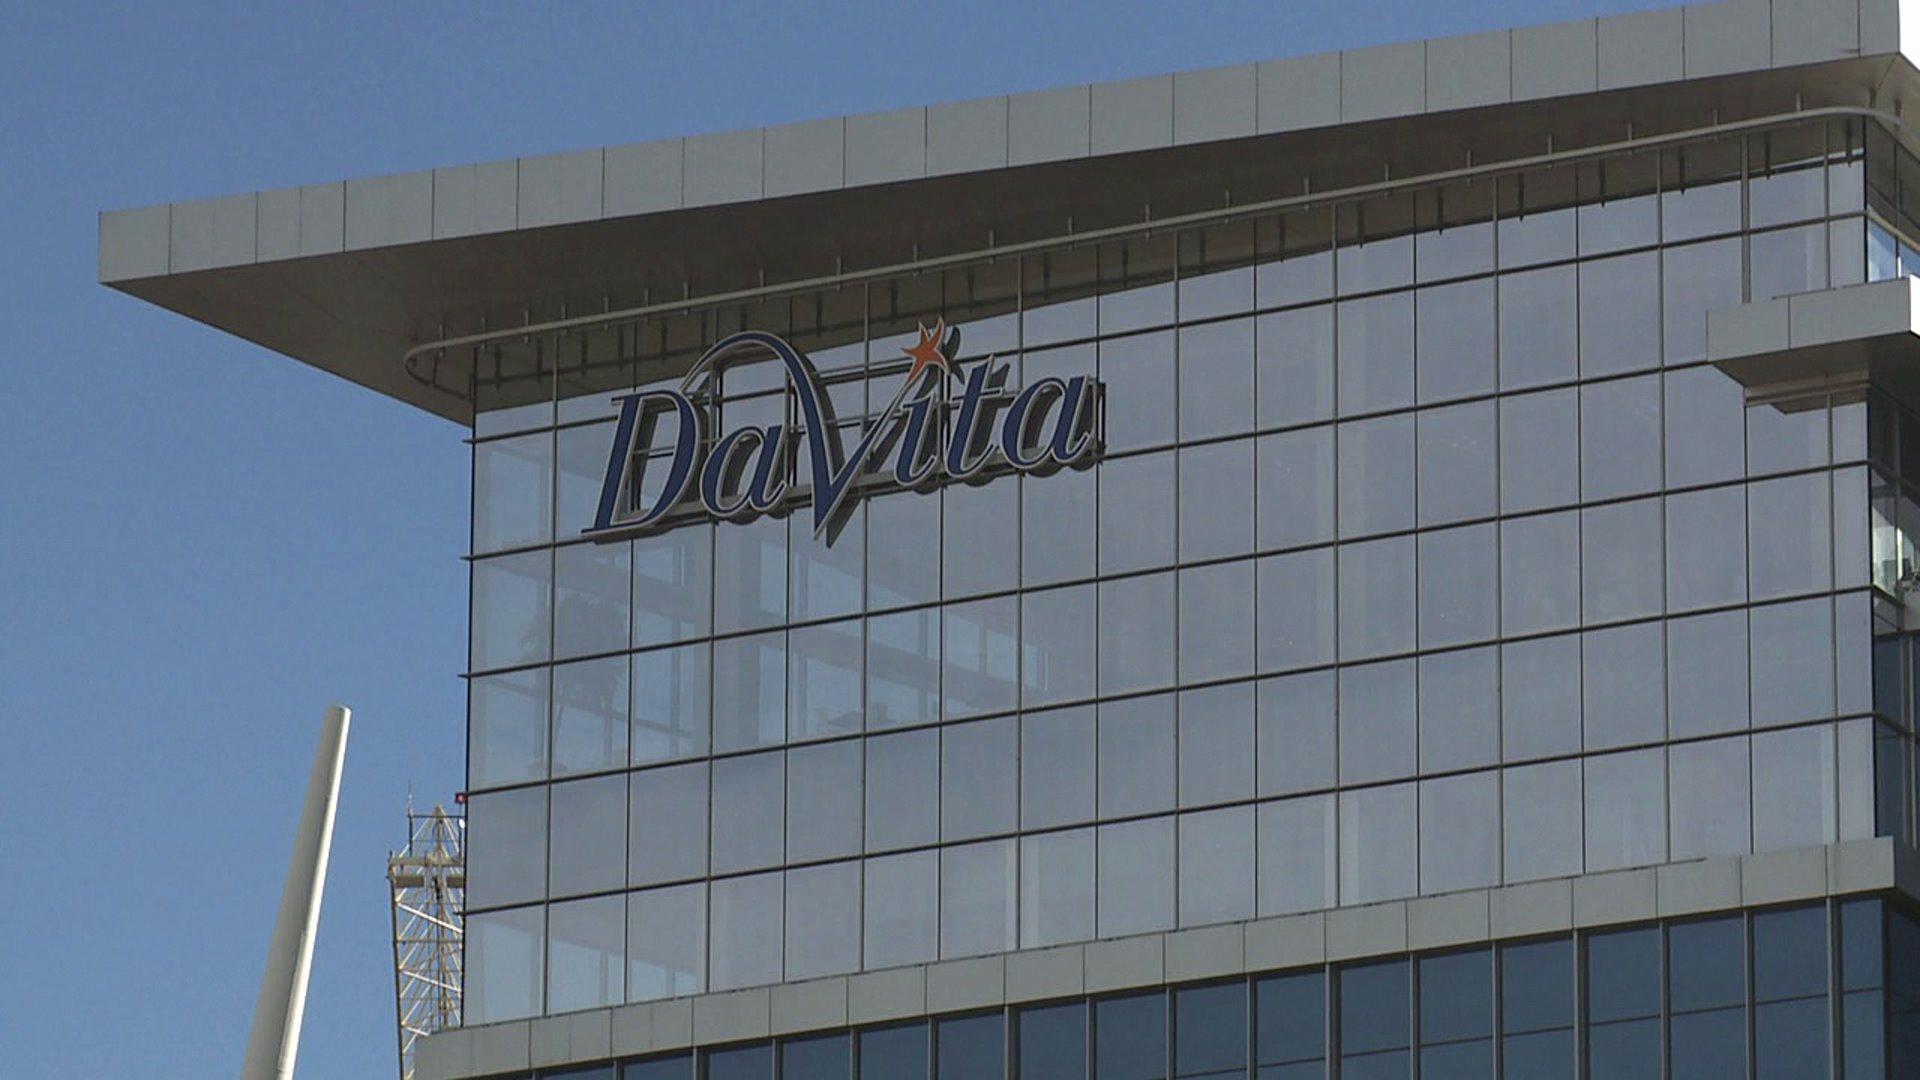 DaVita's corporate headquarters in lower downtown Denver.